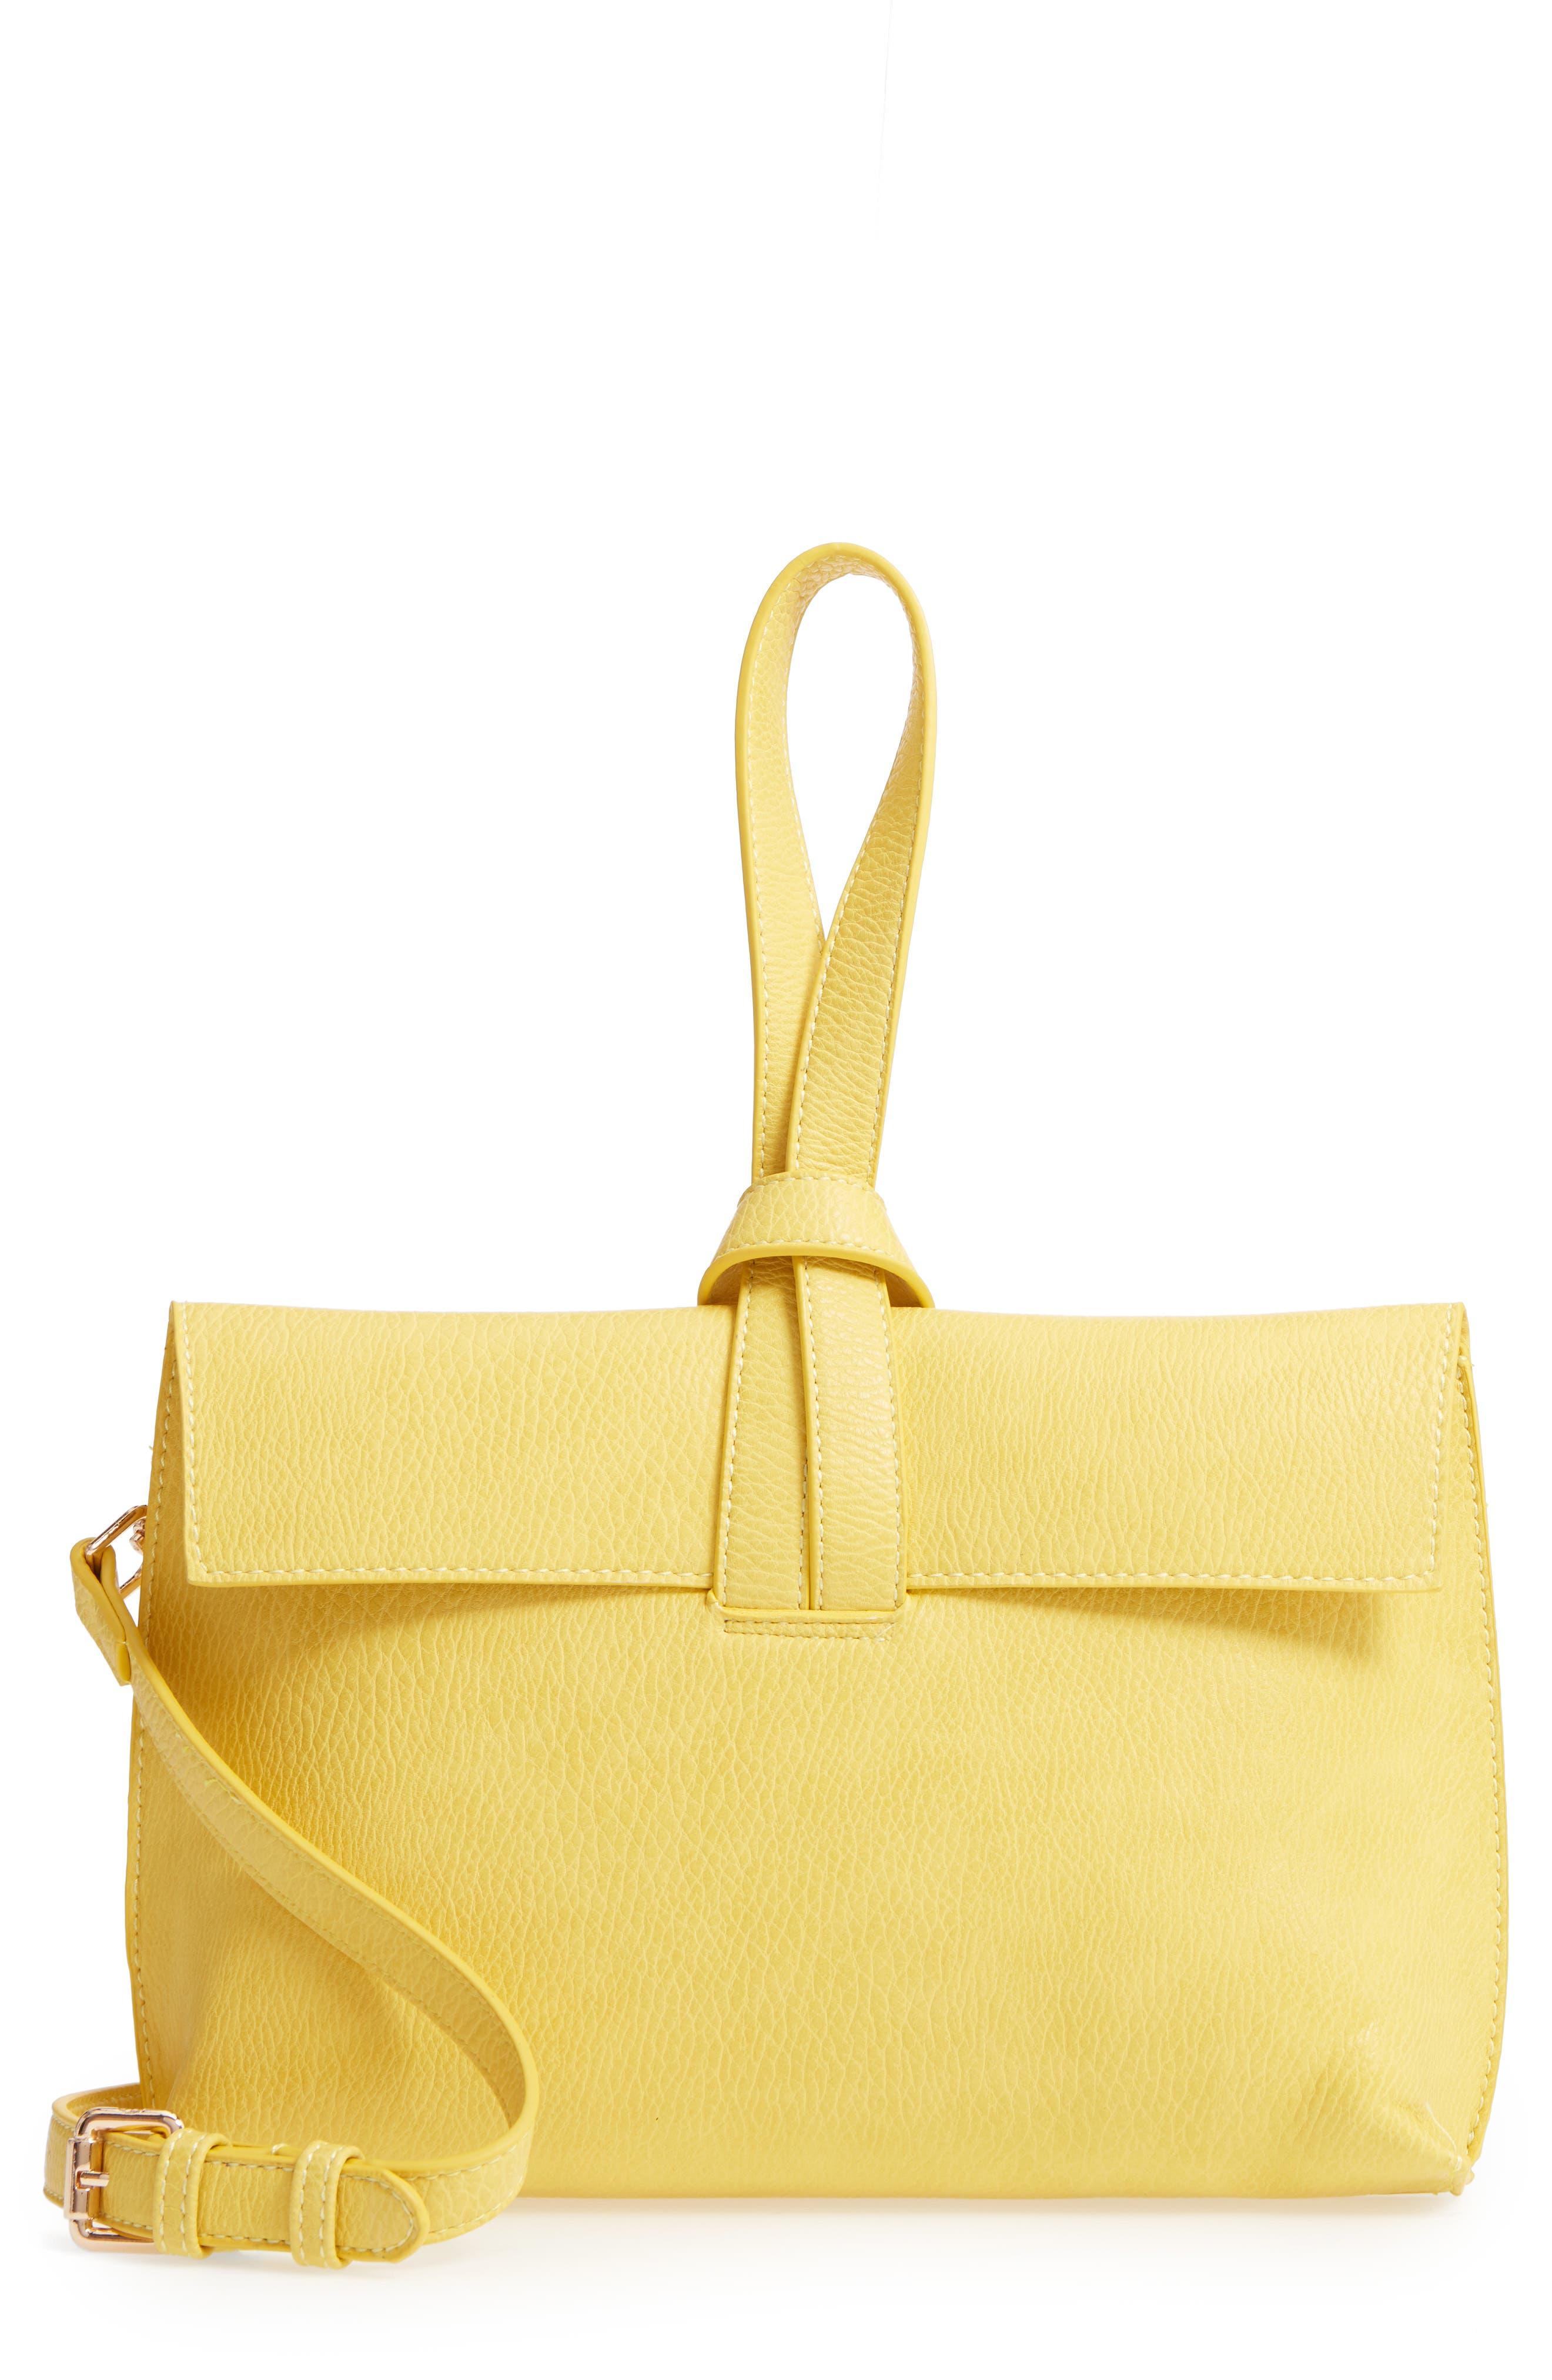 Pull Through Wristlet/Crossbody Bag,                         Main,                         color, YELLOW